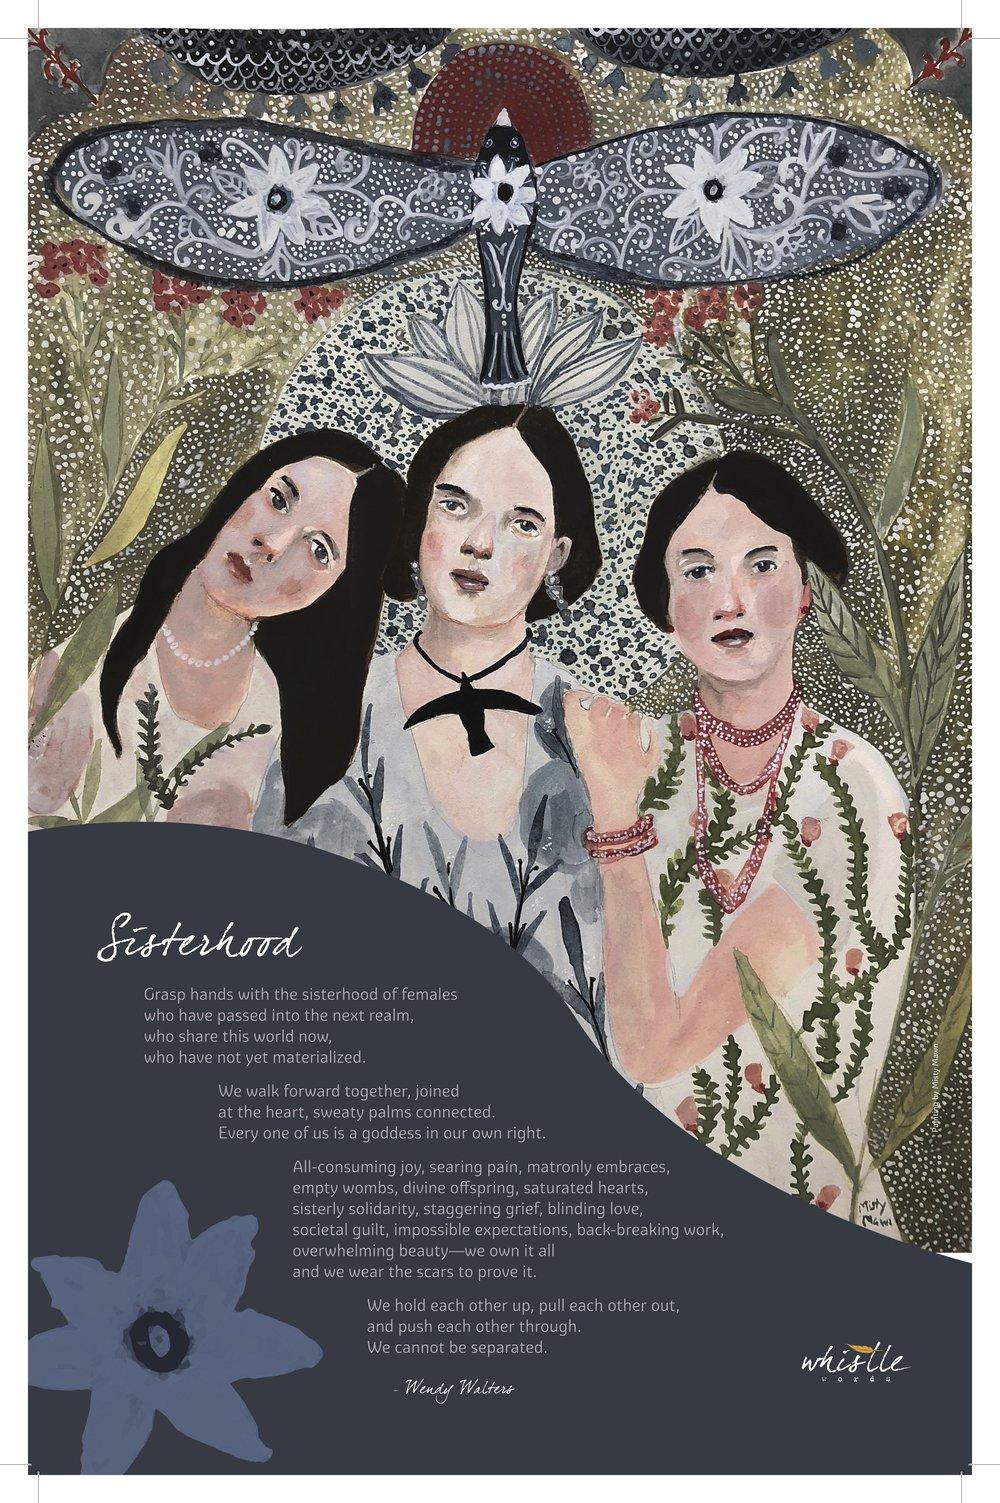 11x17 4-color Poster on 100lb cover stock: SISTERHOOD